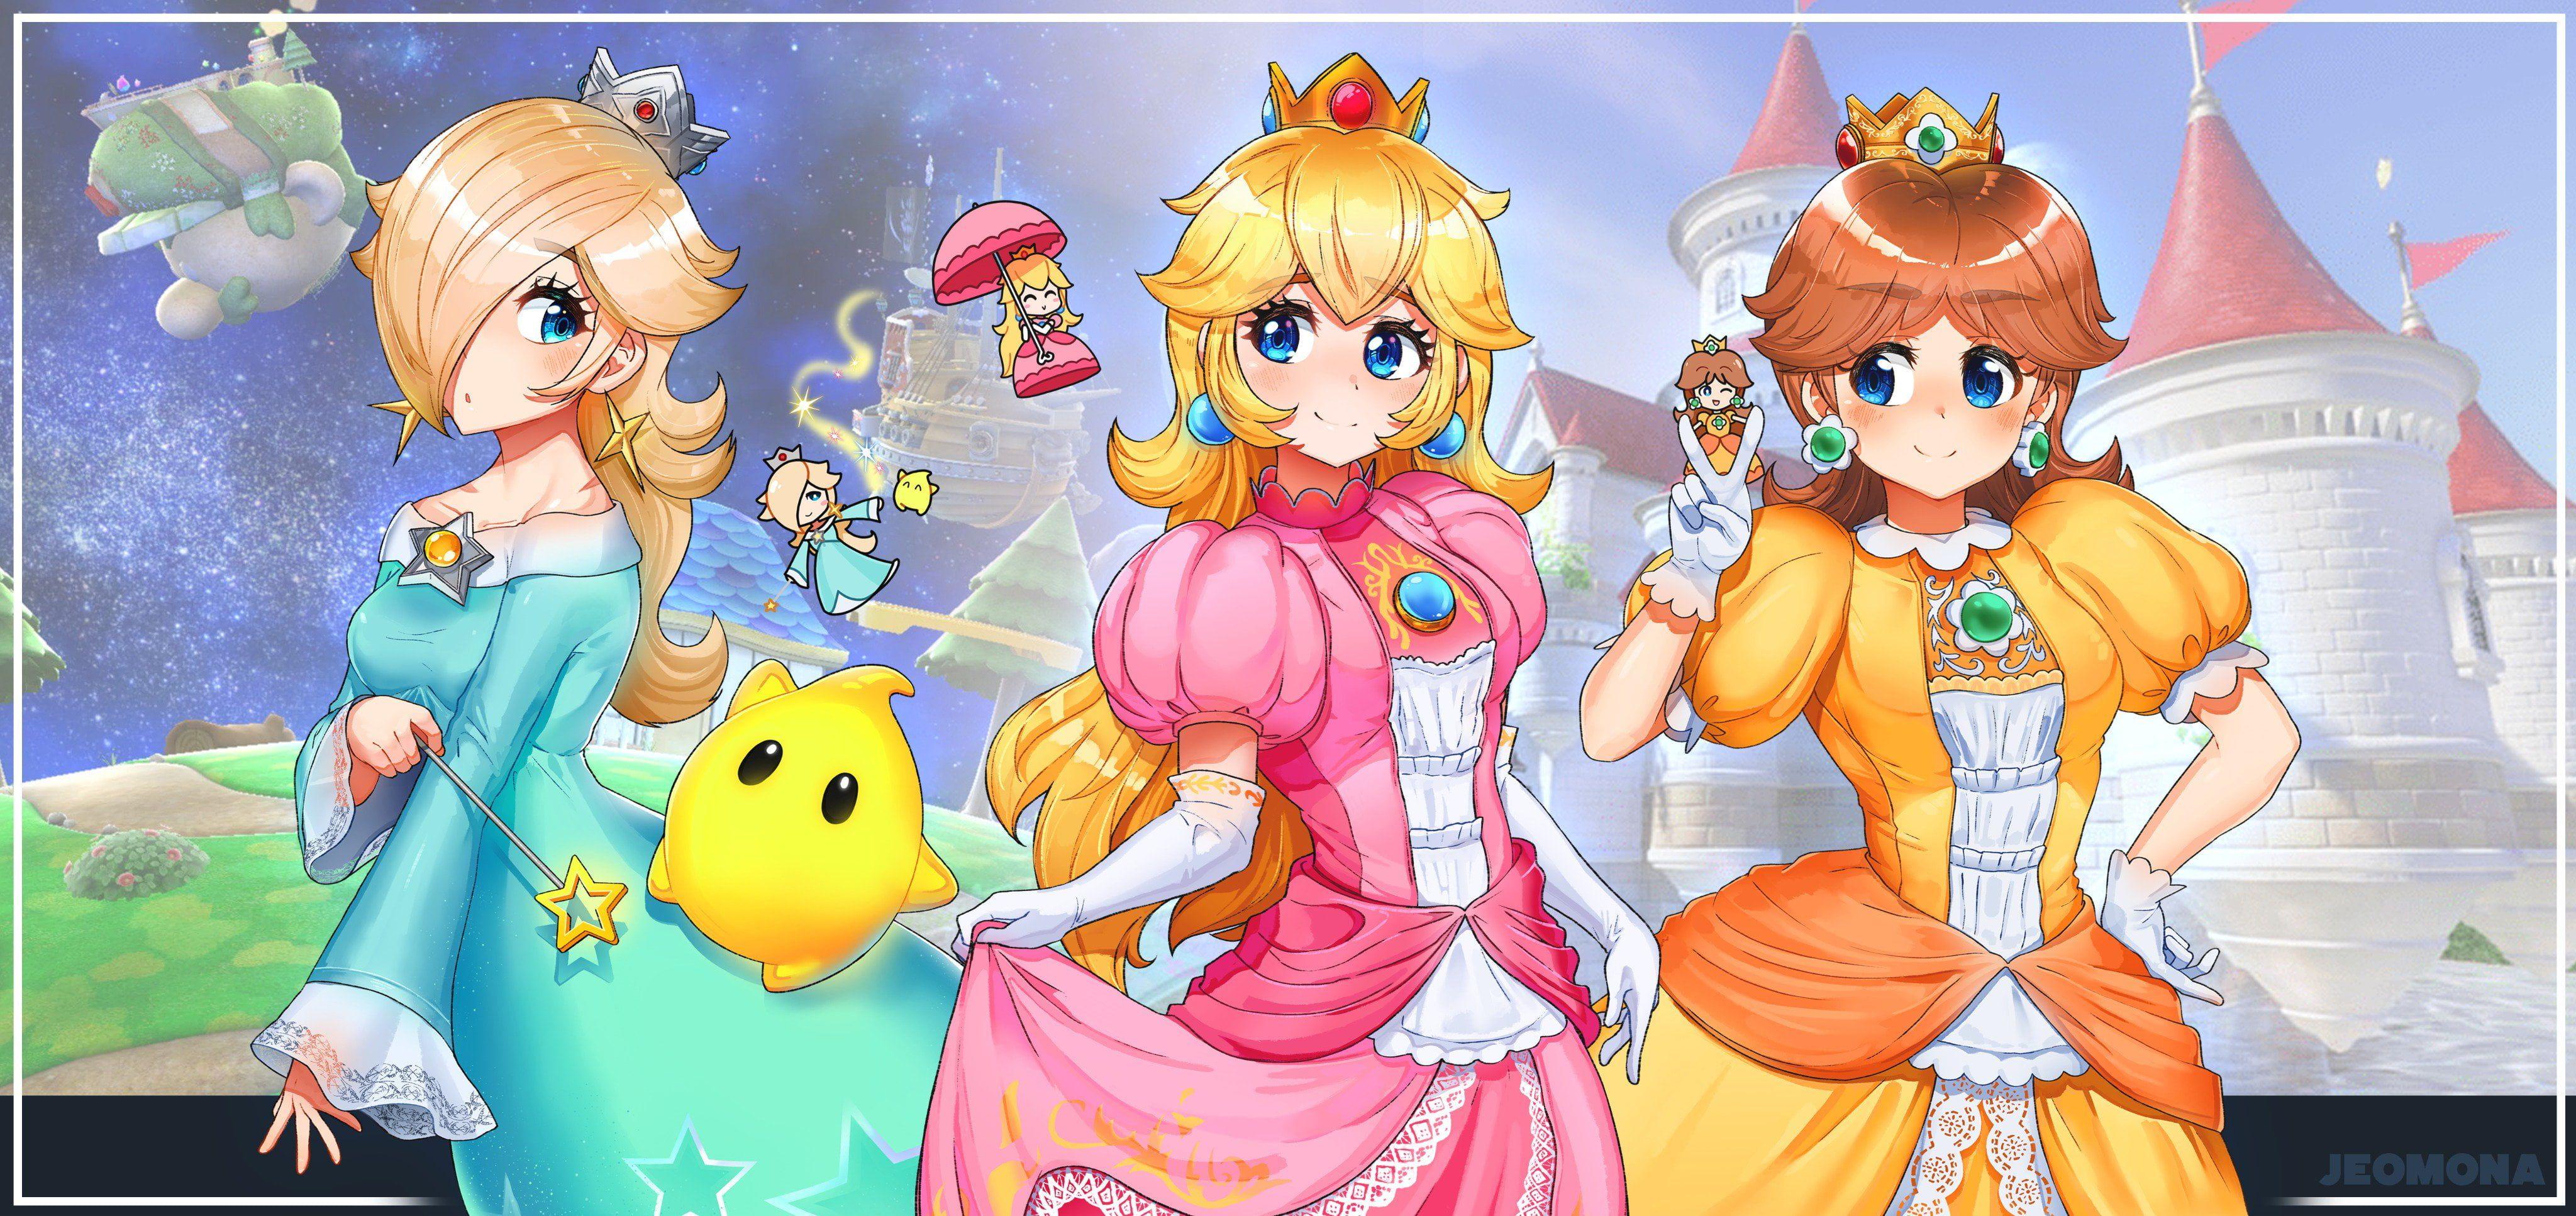 Mario Bros Princess Rosalina Princess Daisy Princess Peach 4k Wallpaper Hdwallpaper Desktop Peach Wallpaper Princess Peach Princess Daisy